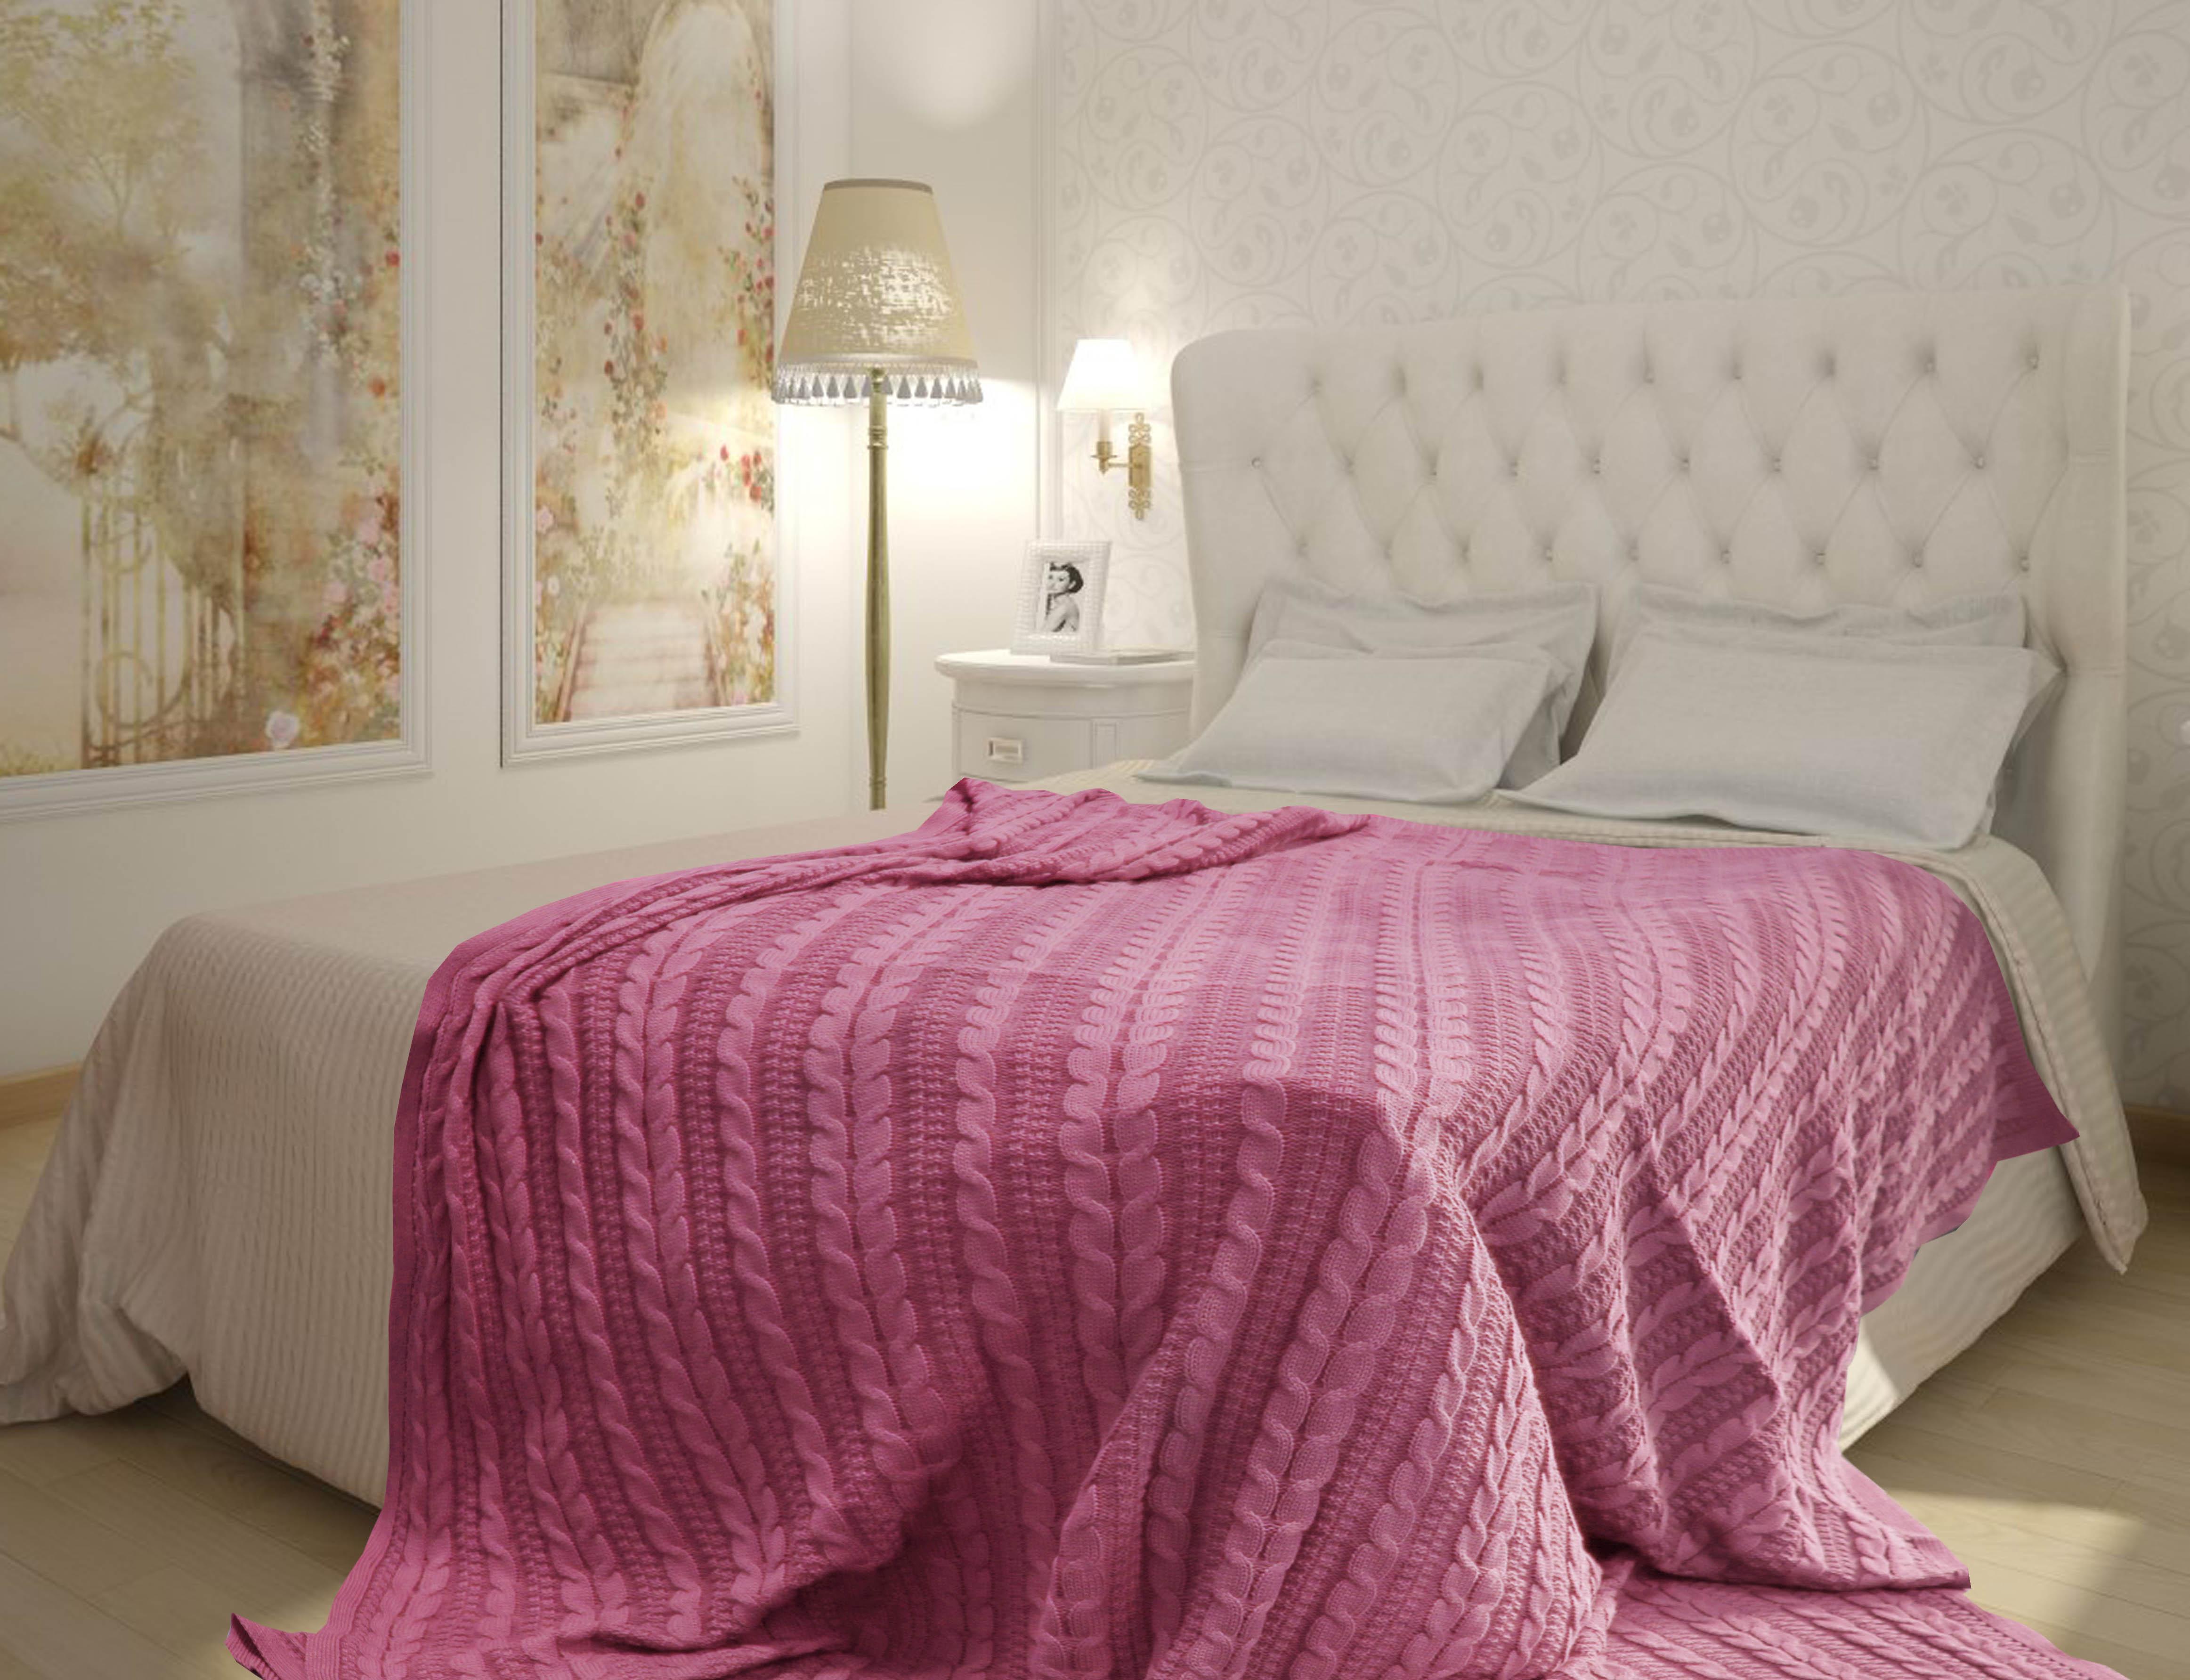 Плед Buenas Noches Плед Braid Цвет: Розовый (150х200 см) плед вязаный buenas noches braid h1 1821